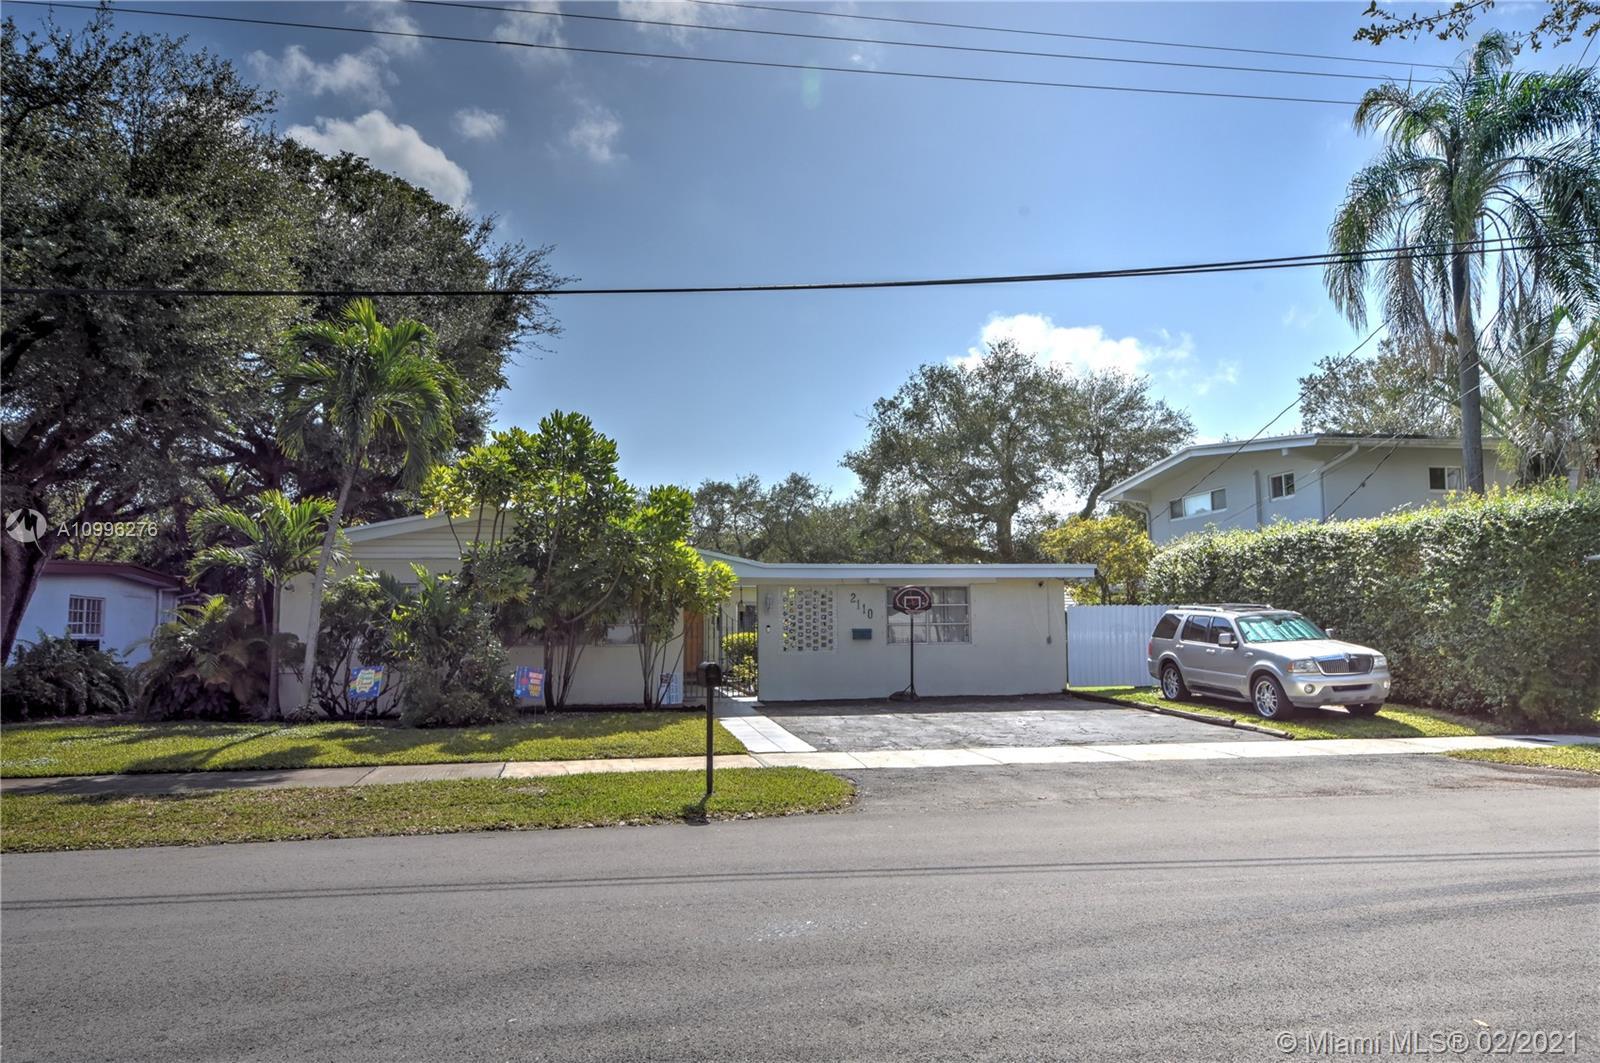 Sky Lake, 2110 NE 191st Dr, North Miami Beach, Florida 33179, image 34